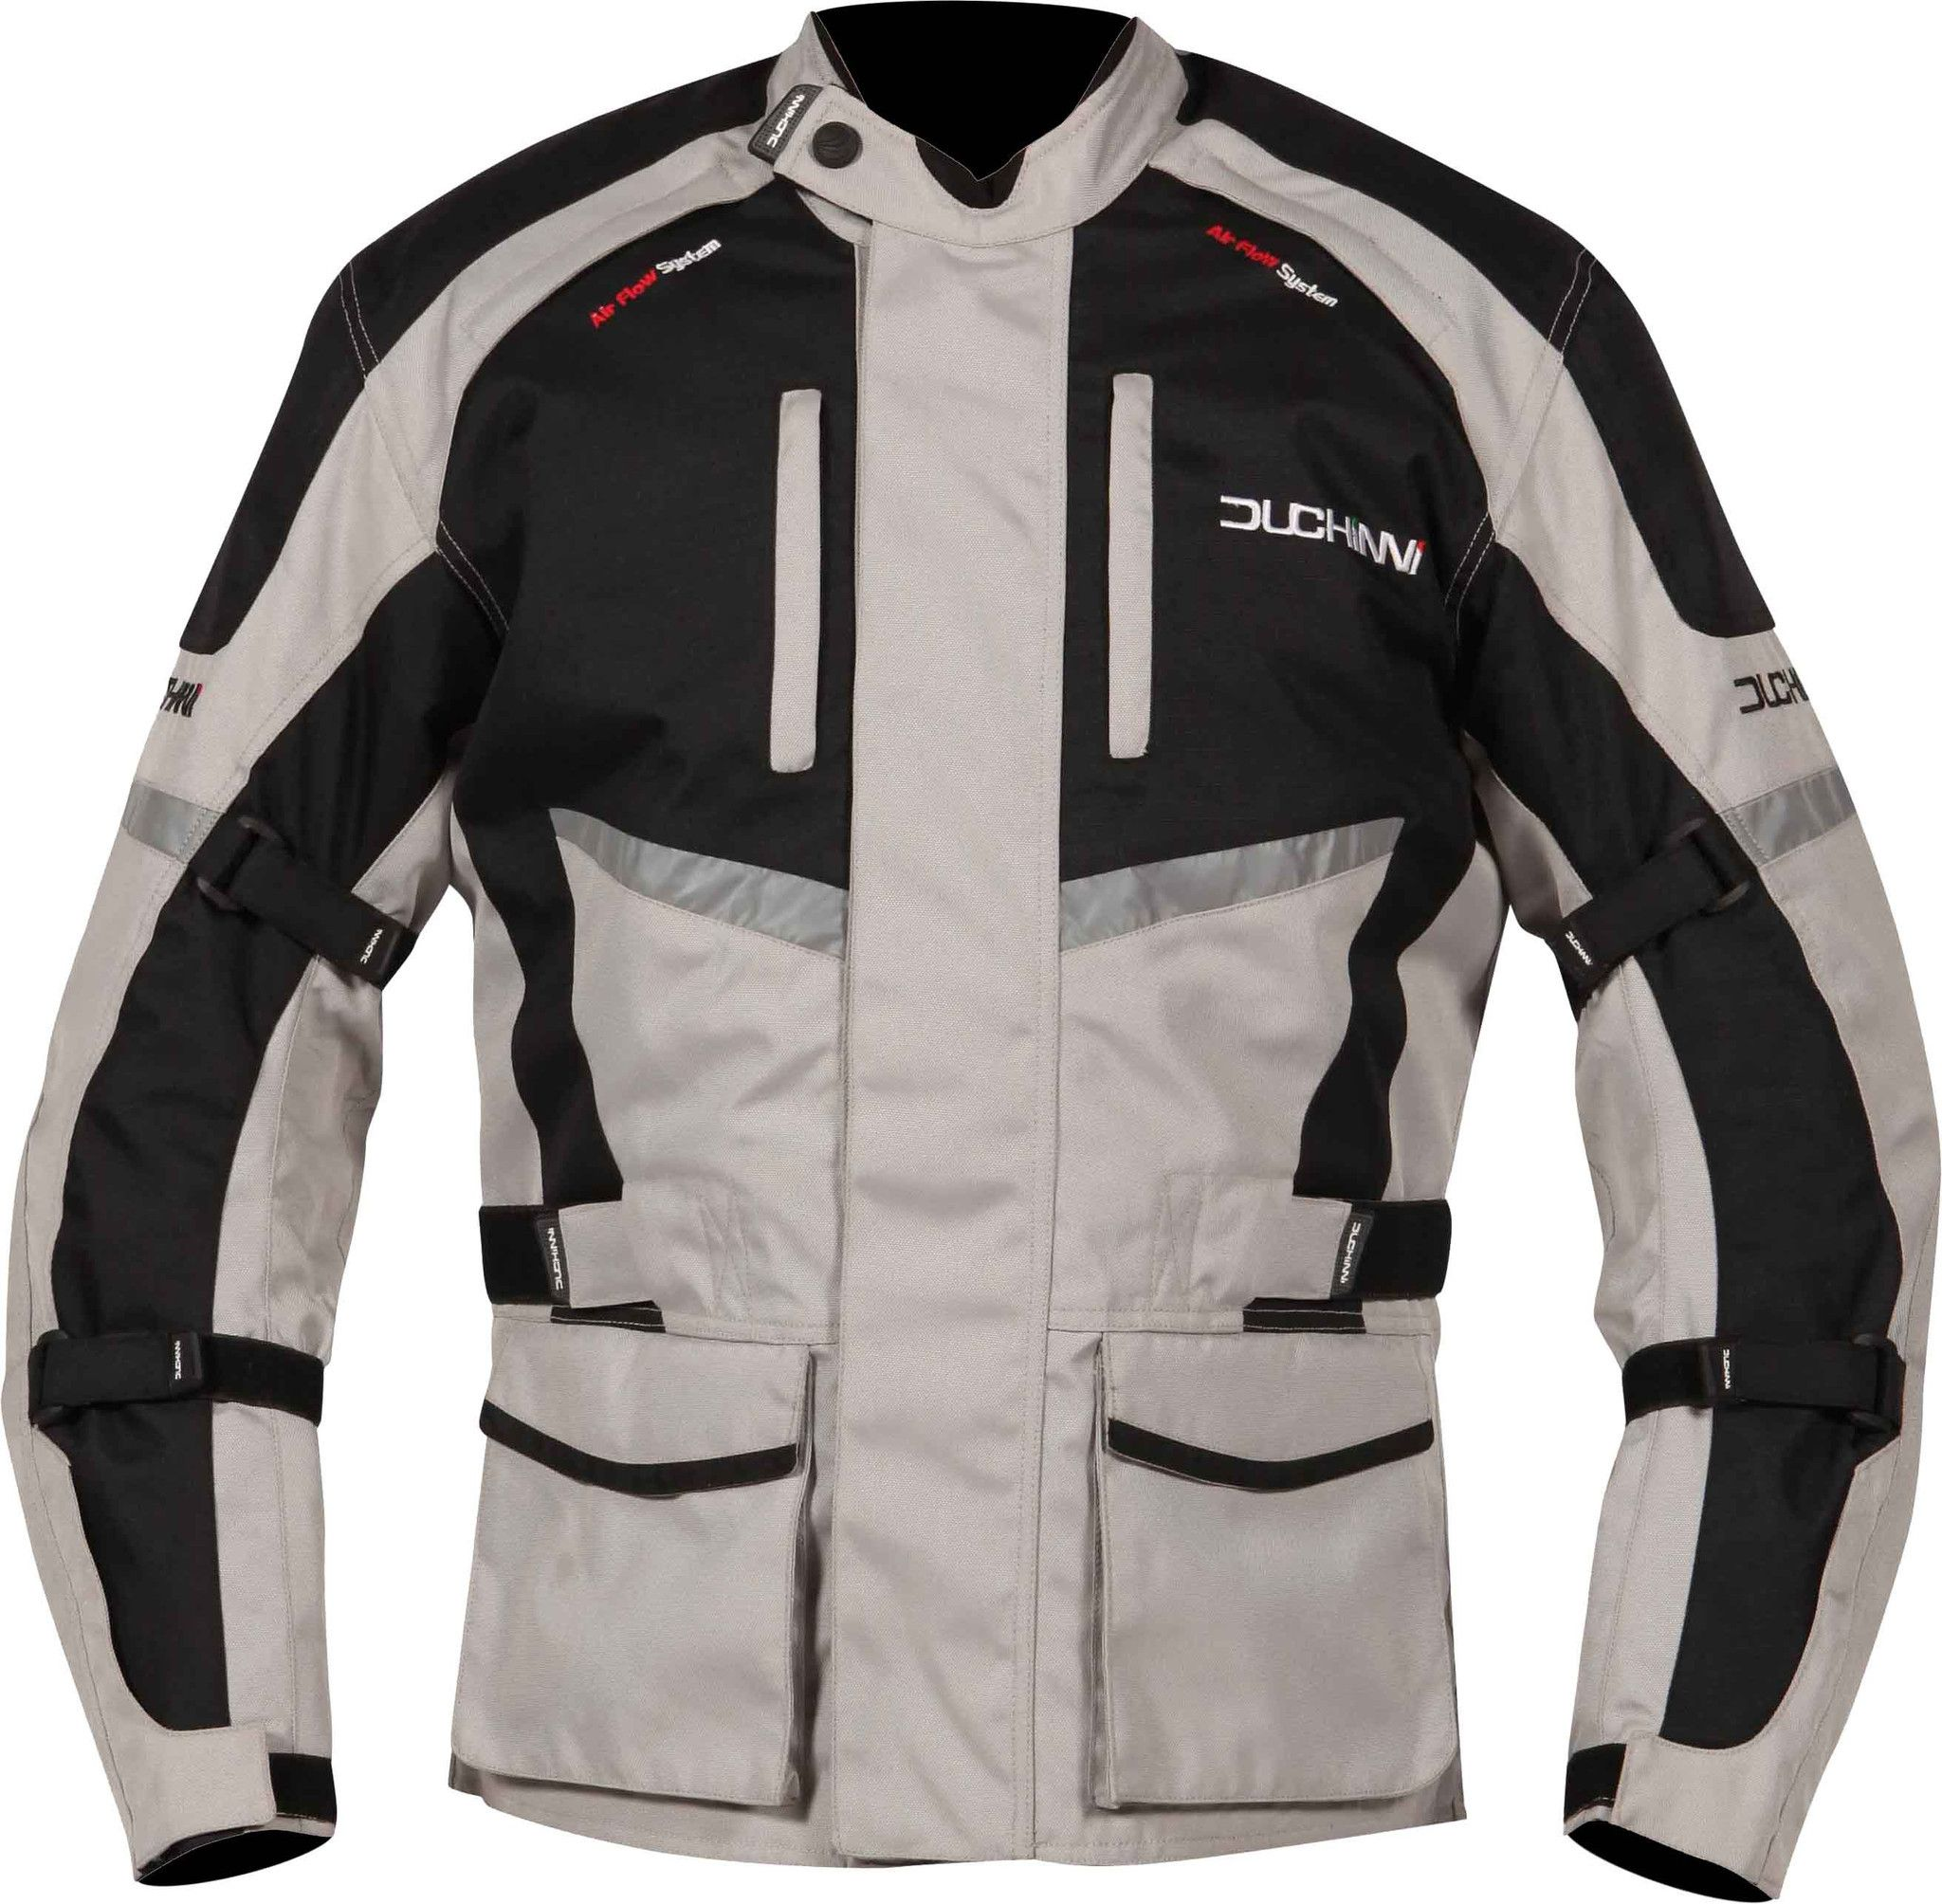 Alpine Motorcycle Gear >> Alpine Motorcycle Jacket Motorcycles Gear N Stuff Pinterest